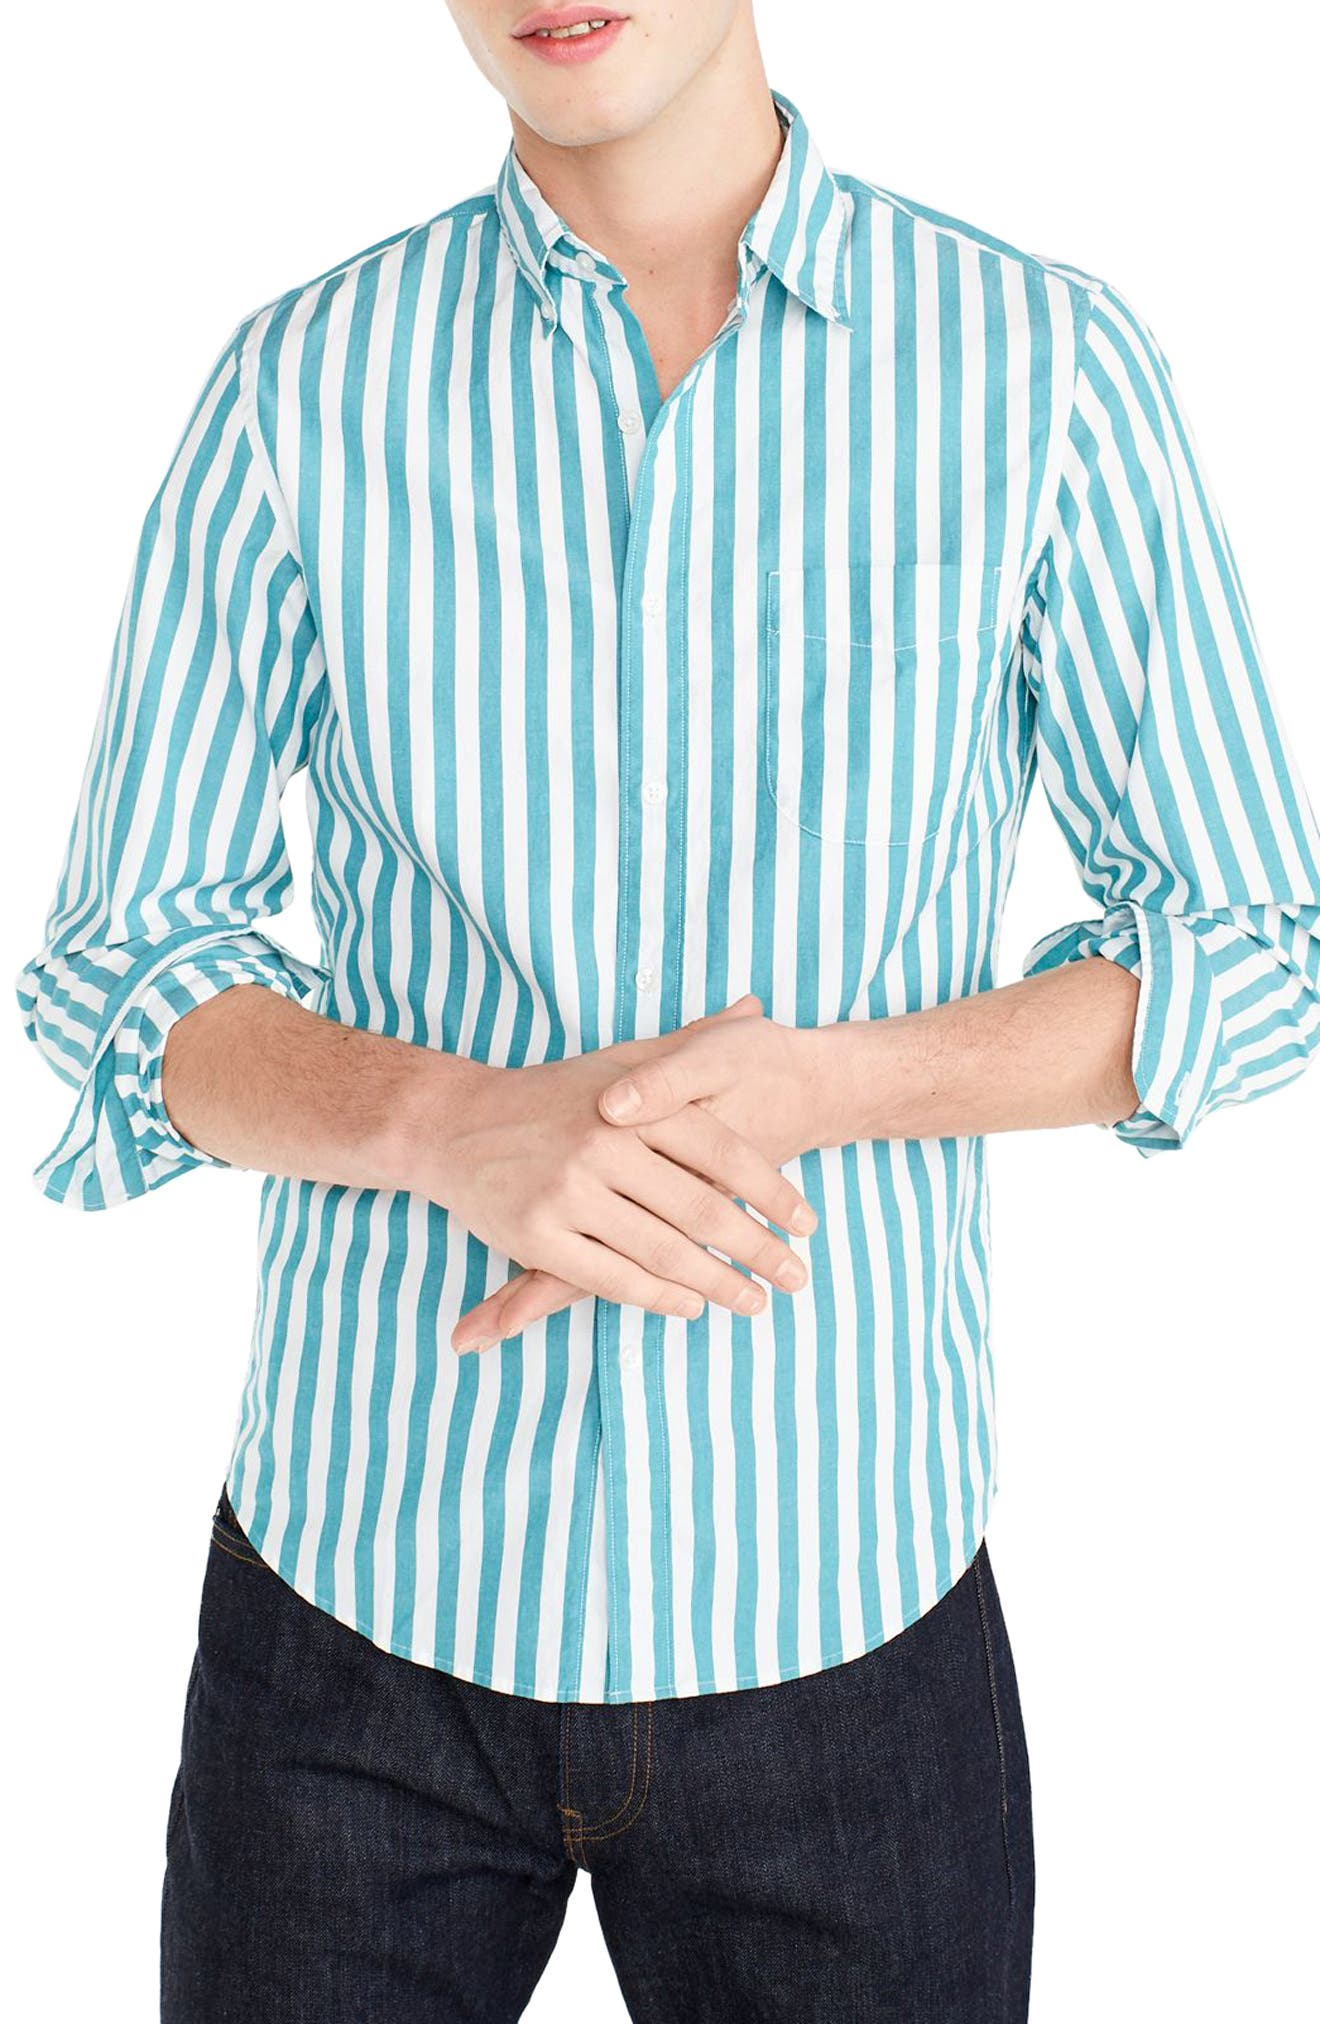 J.Crew Slim Fit Stretch Secret Wash Stripe Sport Shirt,                             Main thumbnail 1, color,                             Bright Turquoise